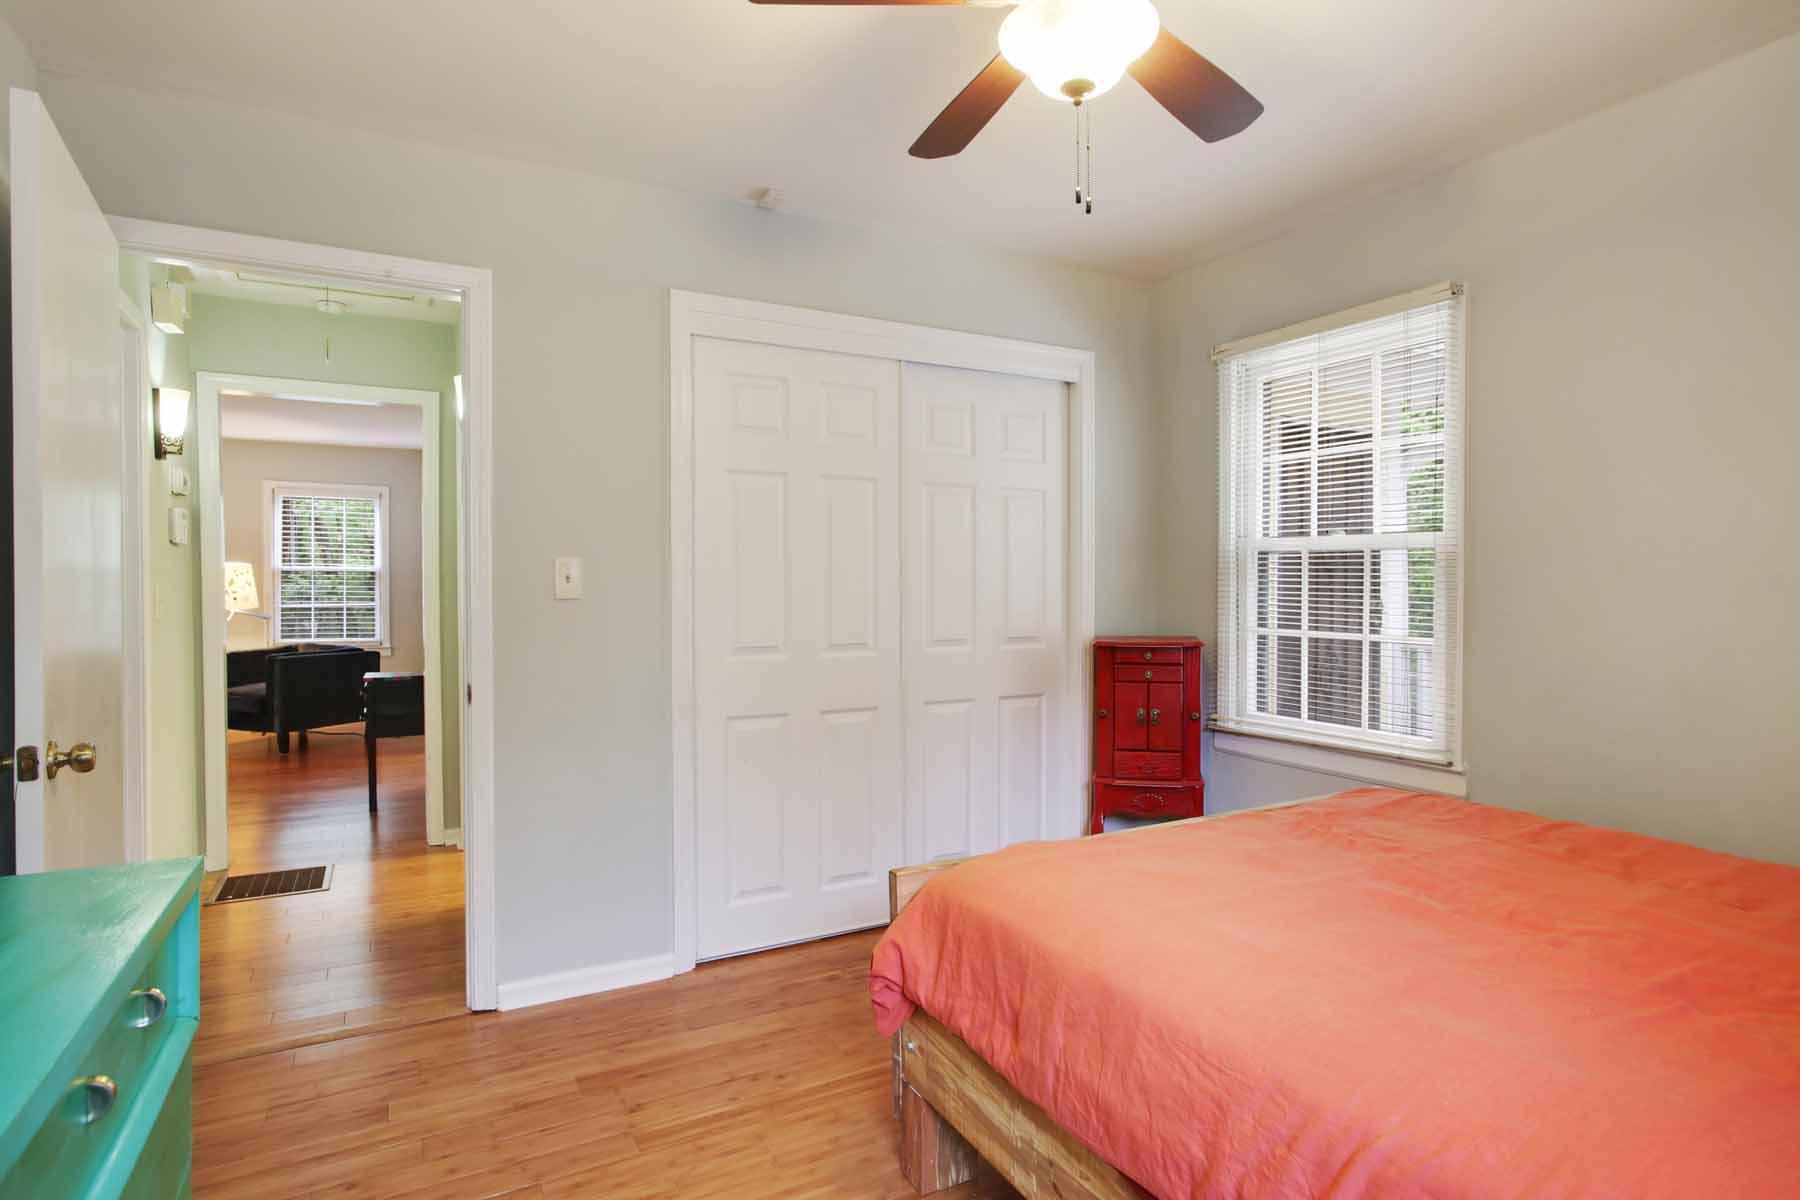 Additional photo for property listing at Amazing Value for 21 Updated Ormewood Park Bungalow! 989 Ormewood Avenue SE Atlanta, 喬治亞州 30316 美國